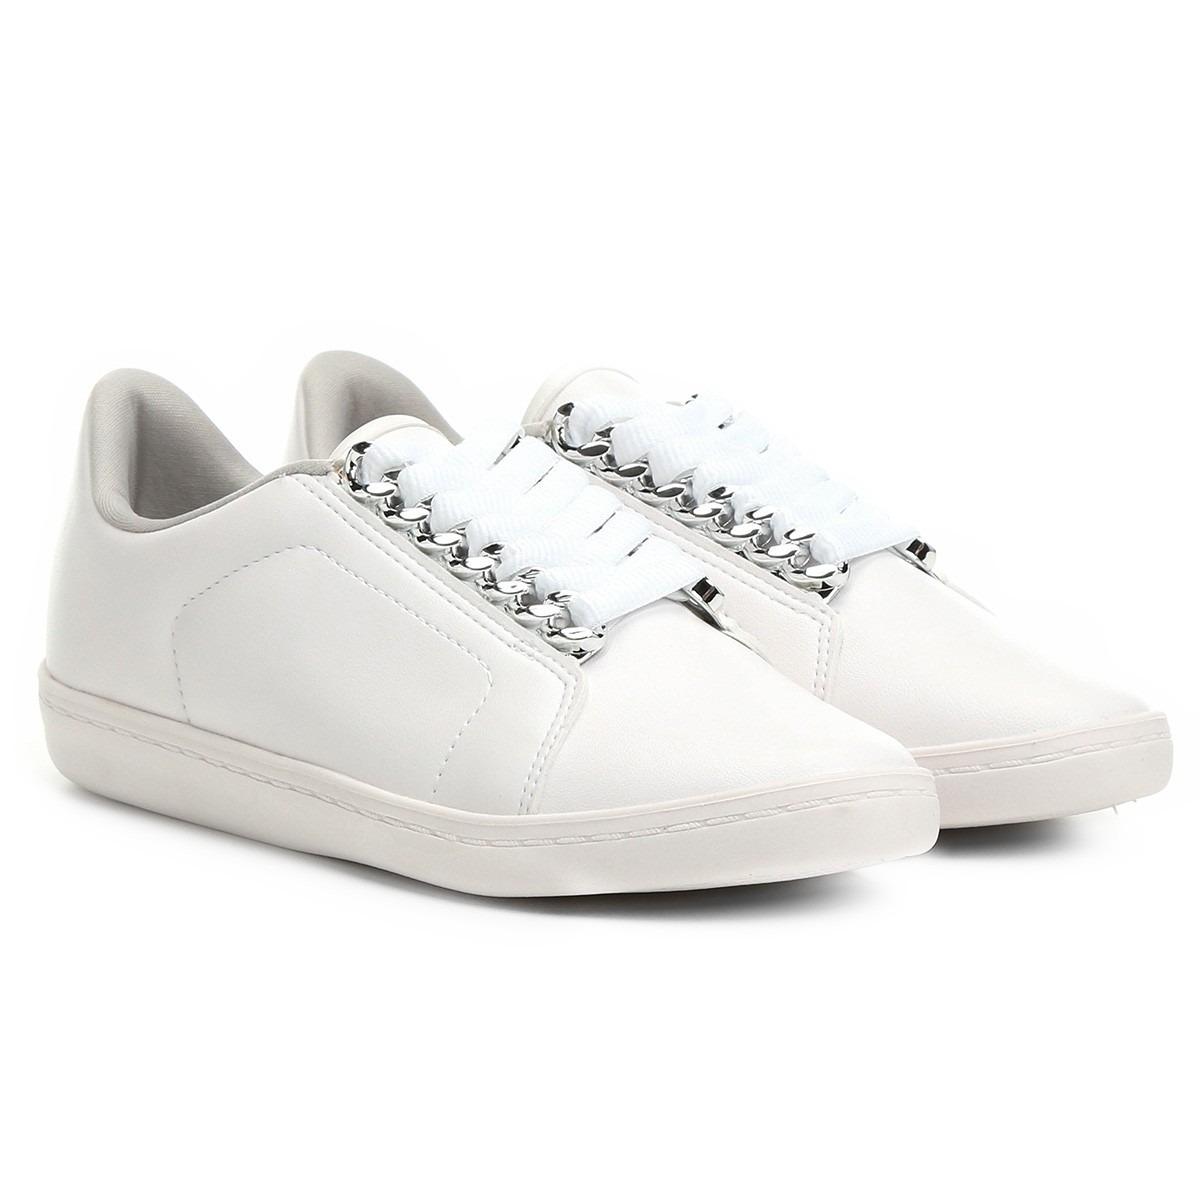 503891d4d2b tenis feminino branco barato macio e confortável. Carregando zoom.